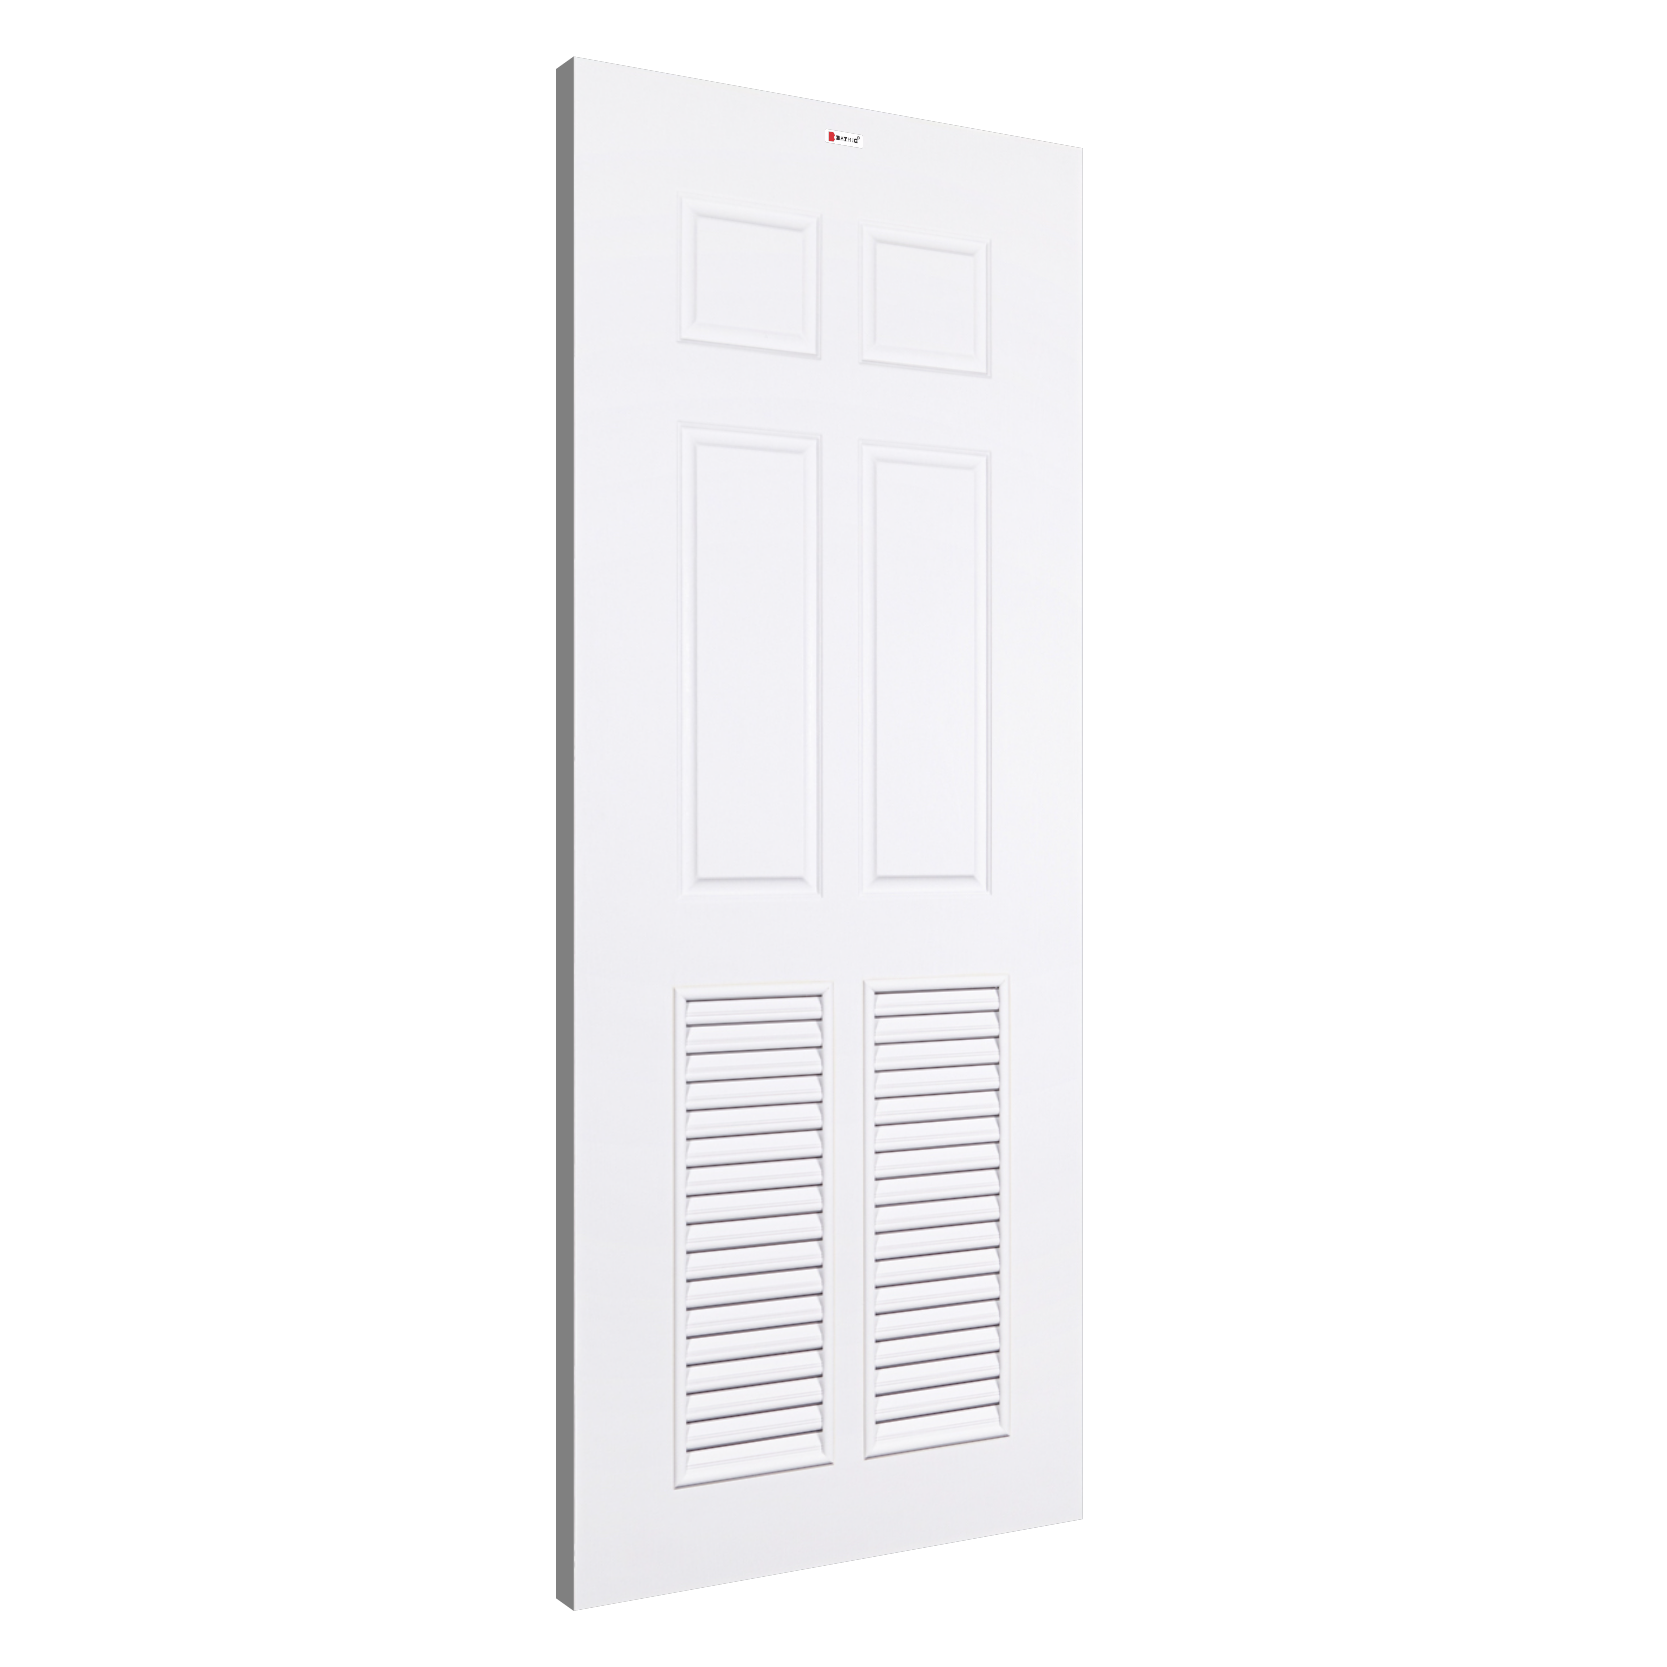 door-upvc-bathic-btl203-white-3